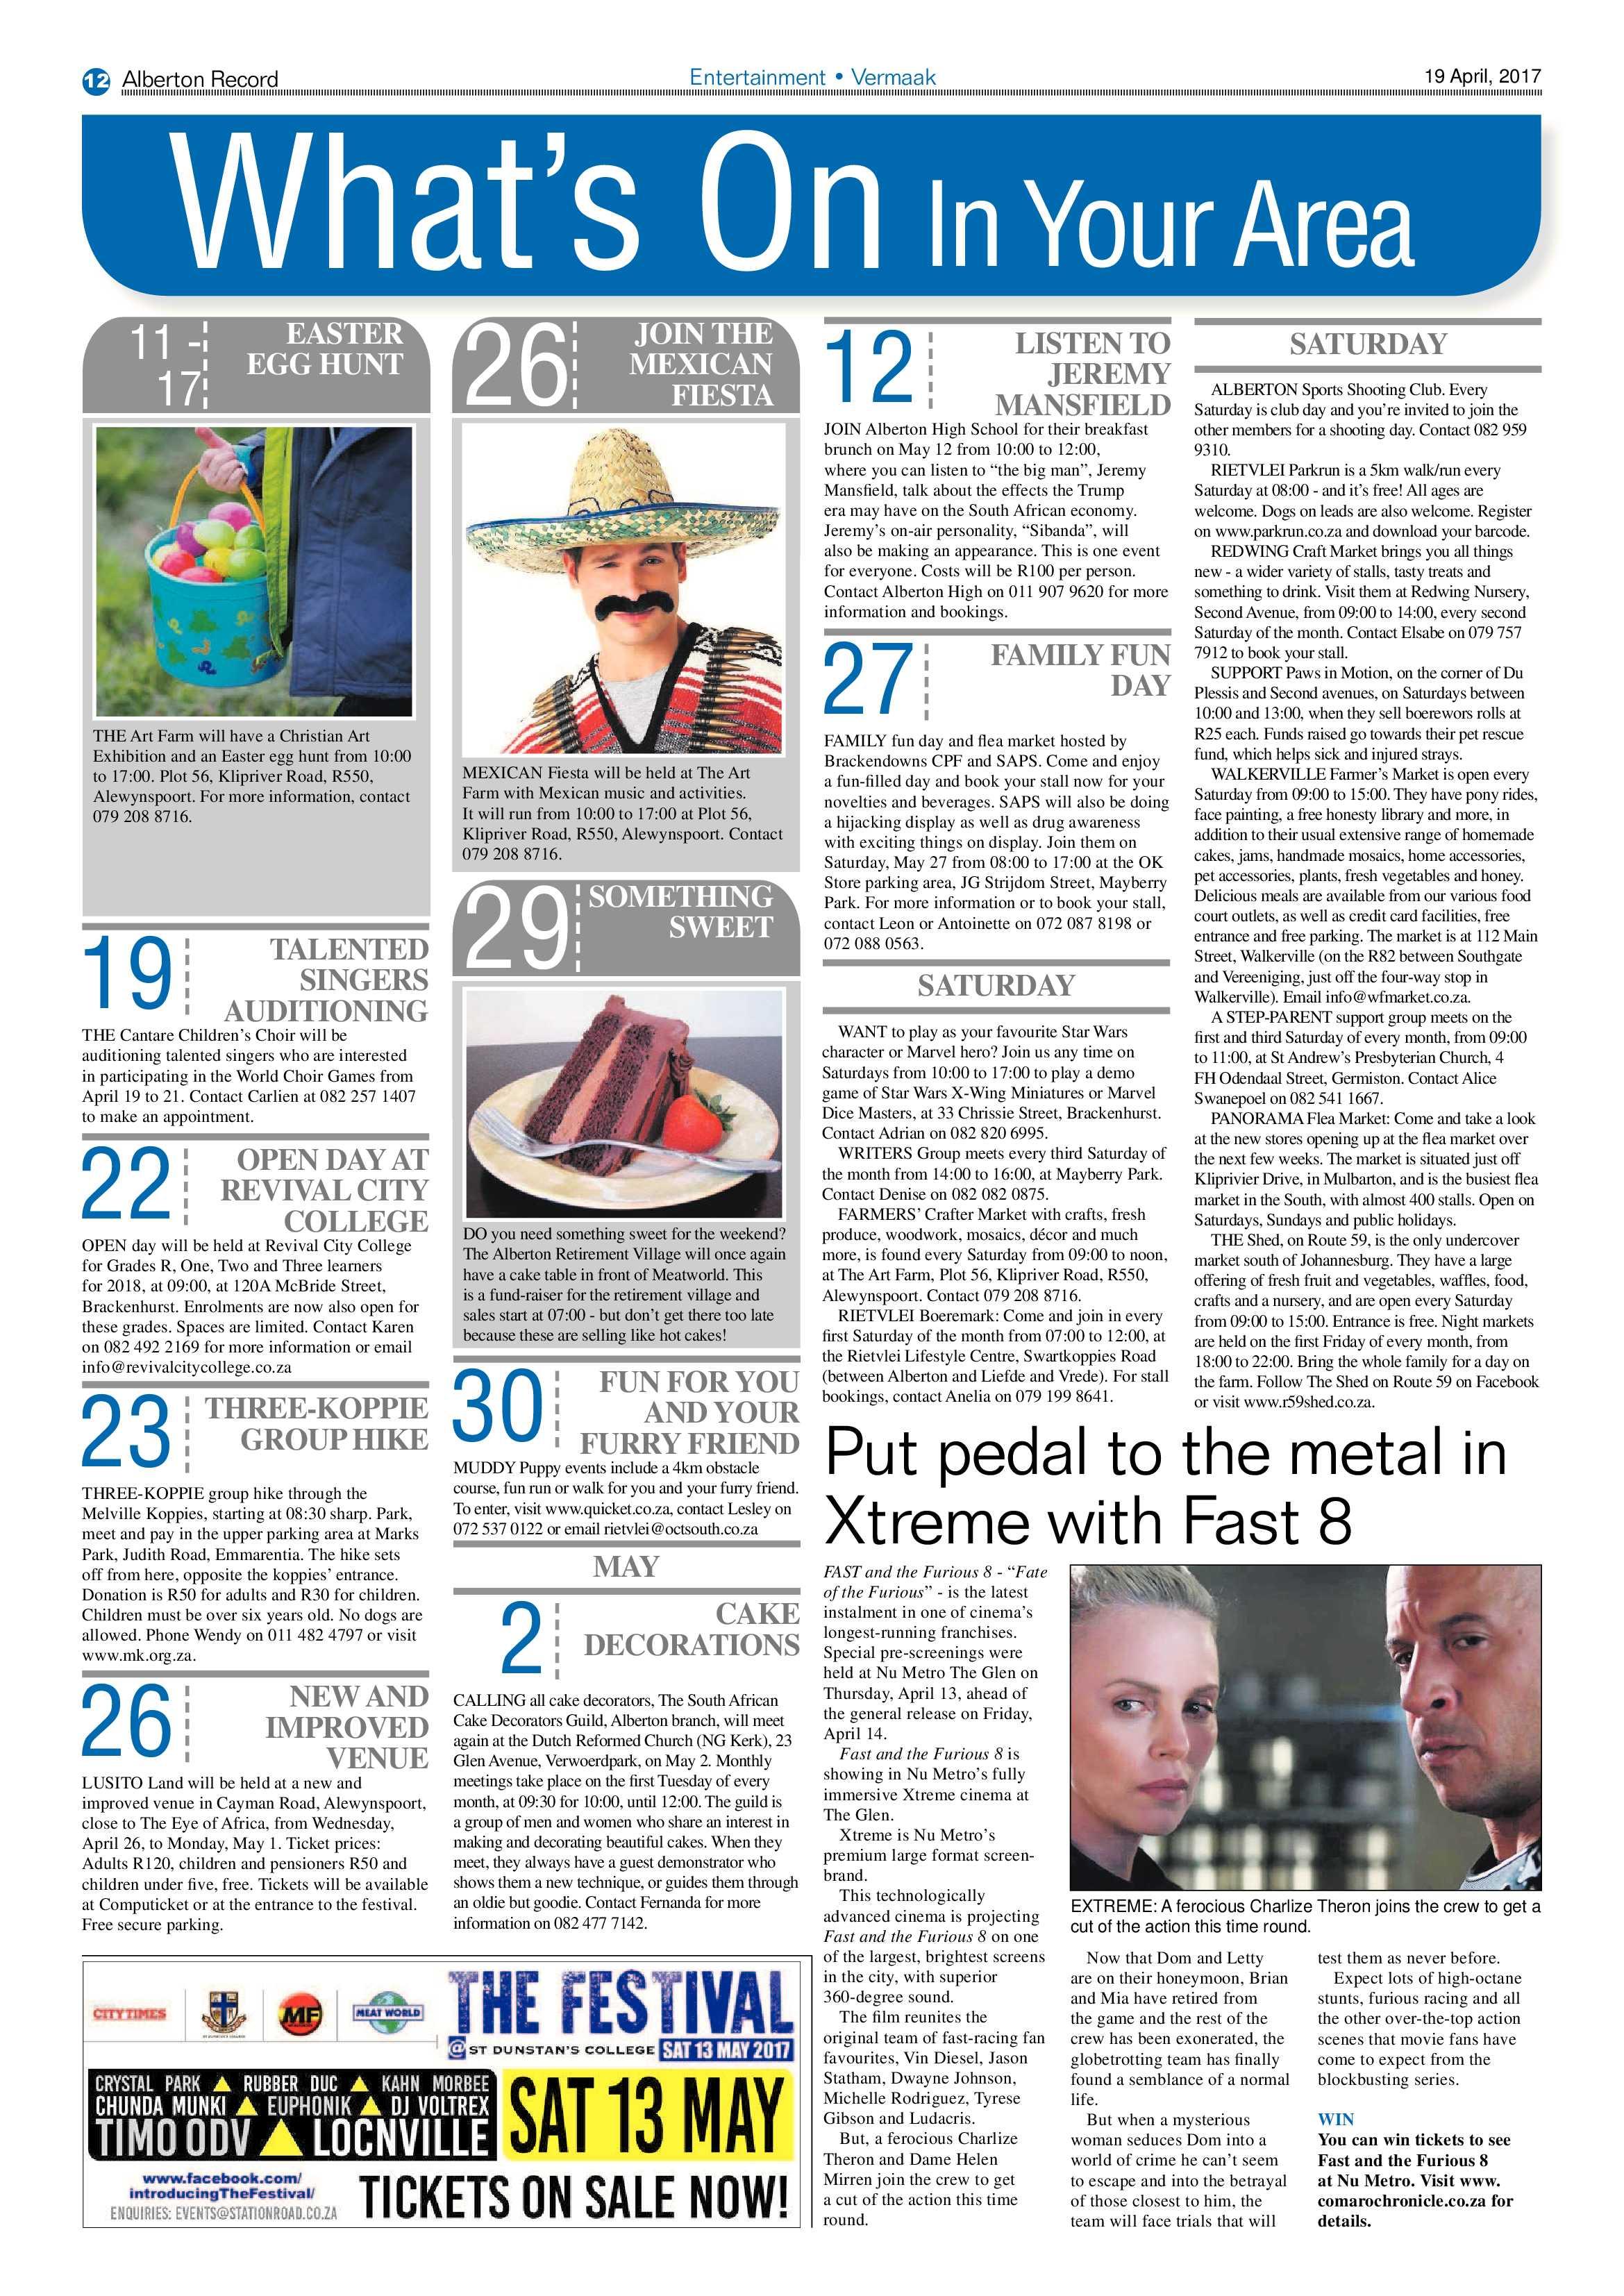 alberton-record-19-april-2017-epapers-page-12